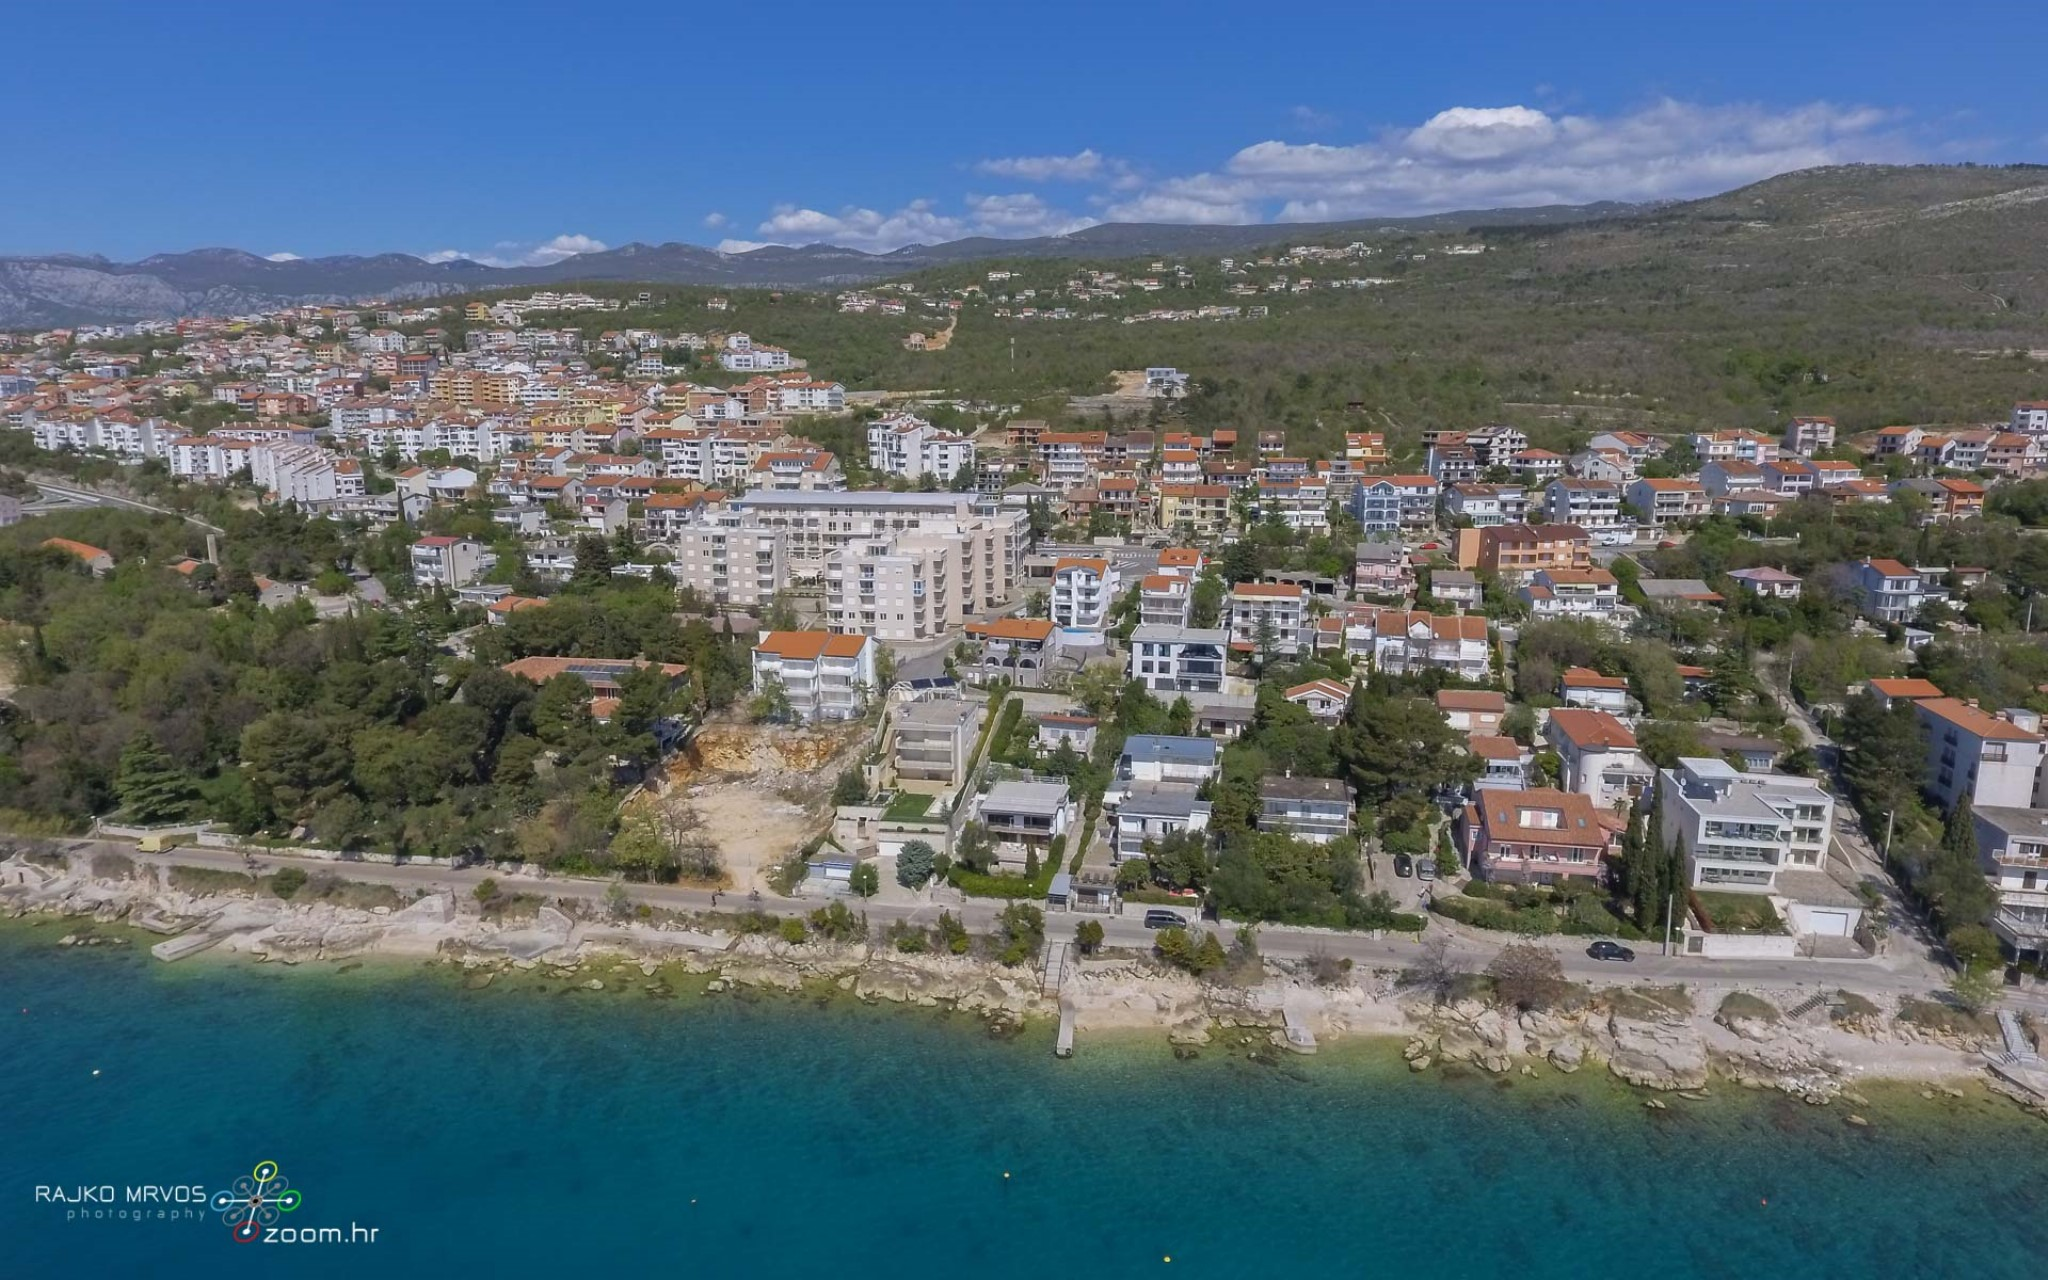 fotografiranje-iz-zraka-eksterijera-dronom-vila-kuca-hotela-apartmana-Larimar-Penthouse-49